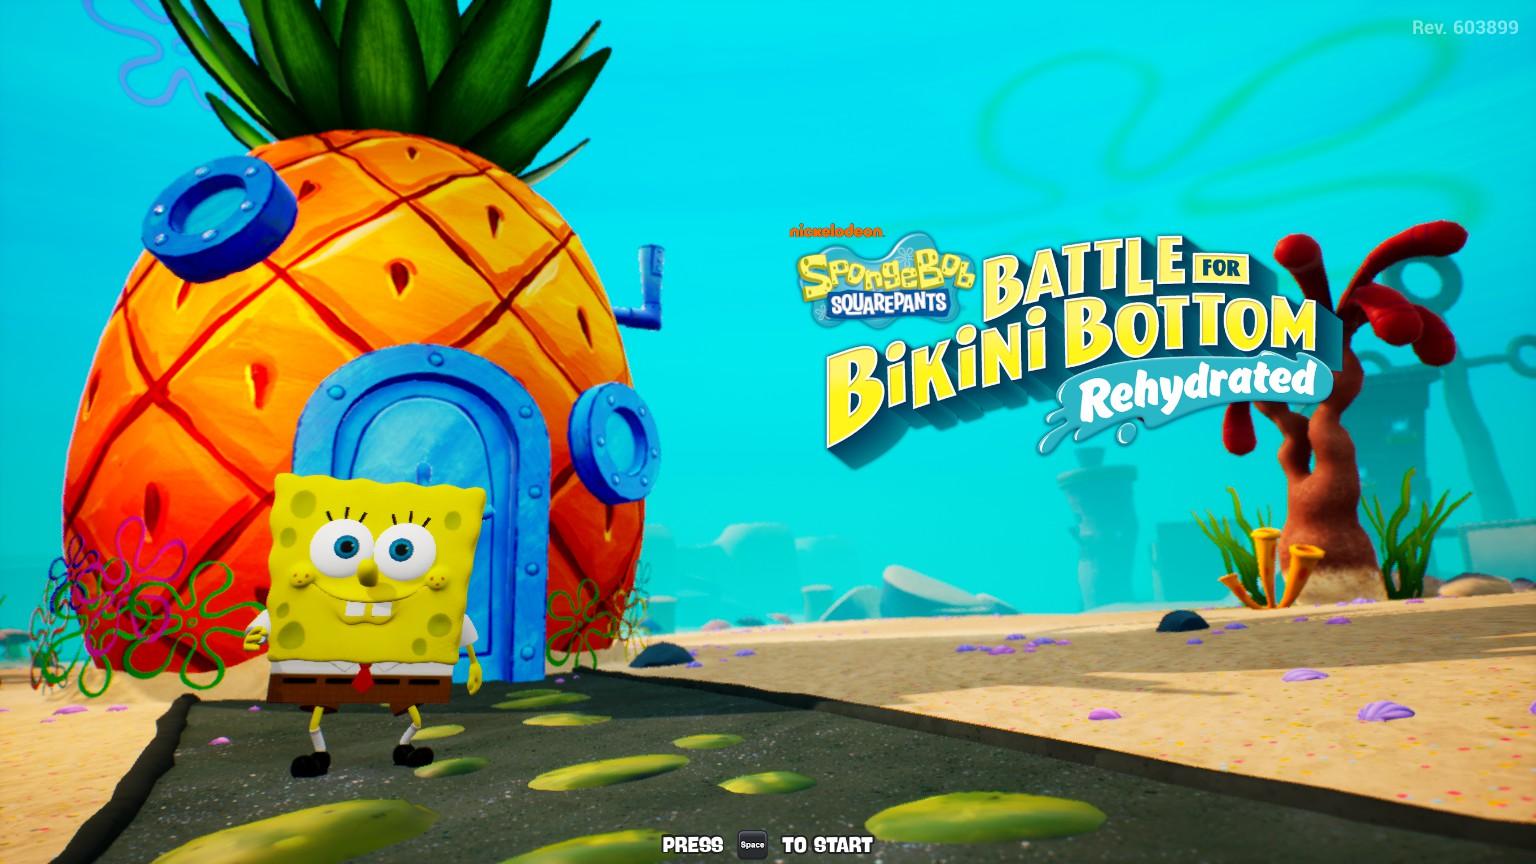 SpongeBob SquarePants: Battle For Bikini Bottom Rehydrated 8Bit/Digi